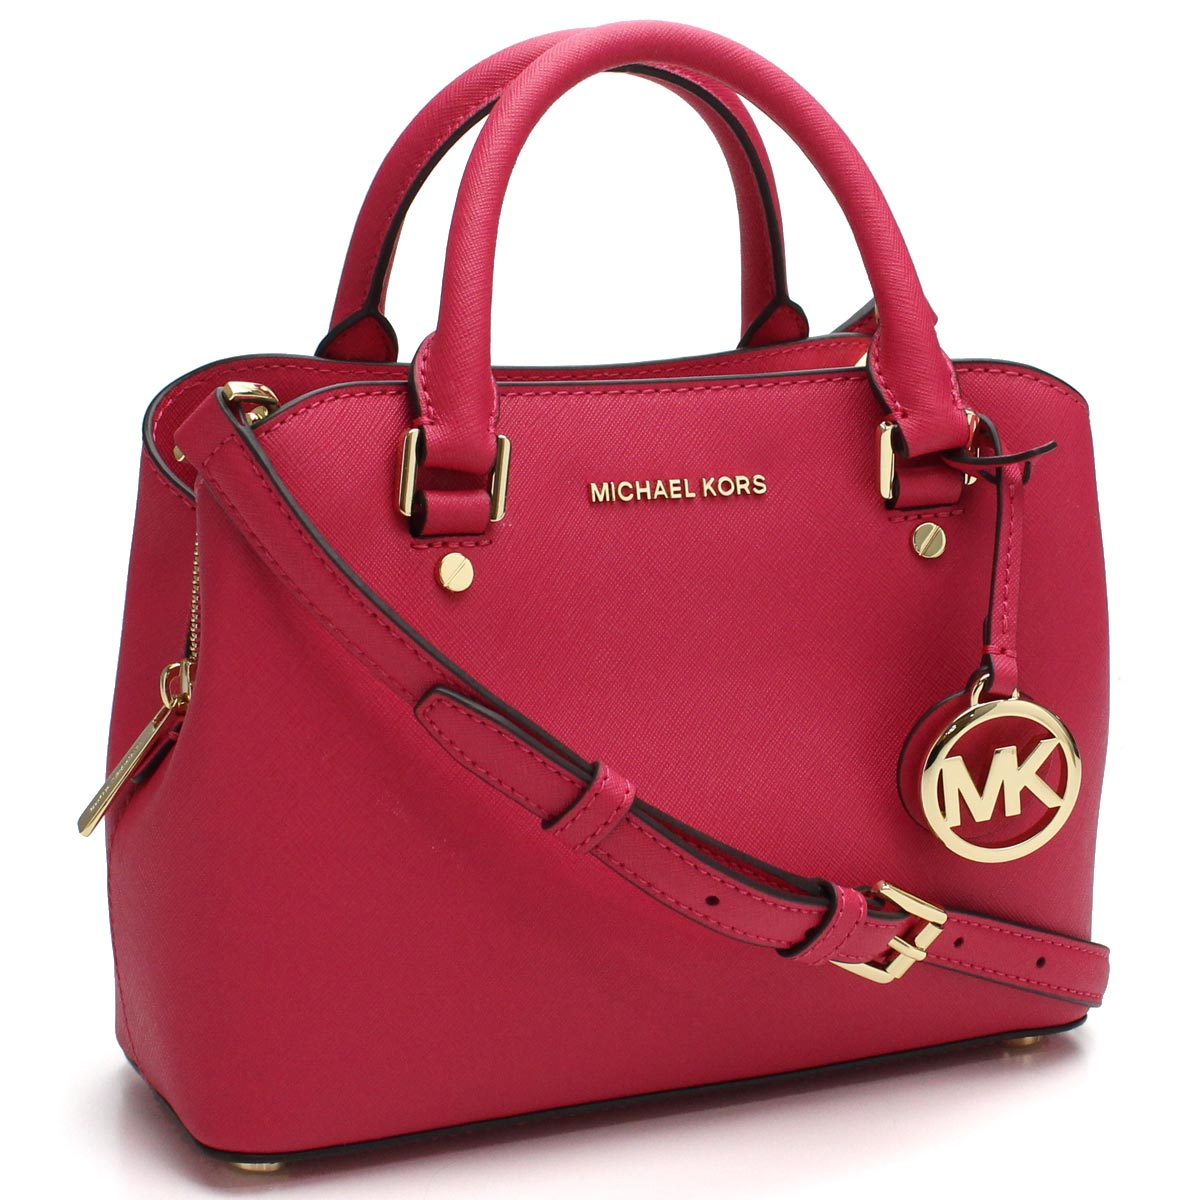 Hit The Total Brand Whole Michael Kors Bag Savannah Savanna 2way Handbag 30s6gs7s1l Ultra Pink System Rakuten Global Market